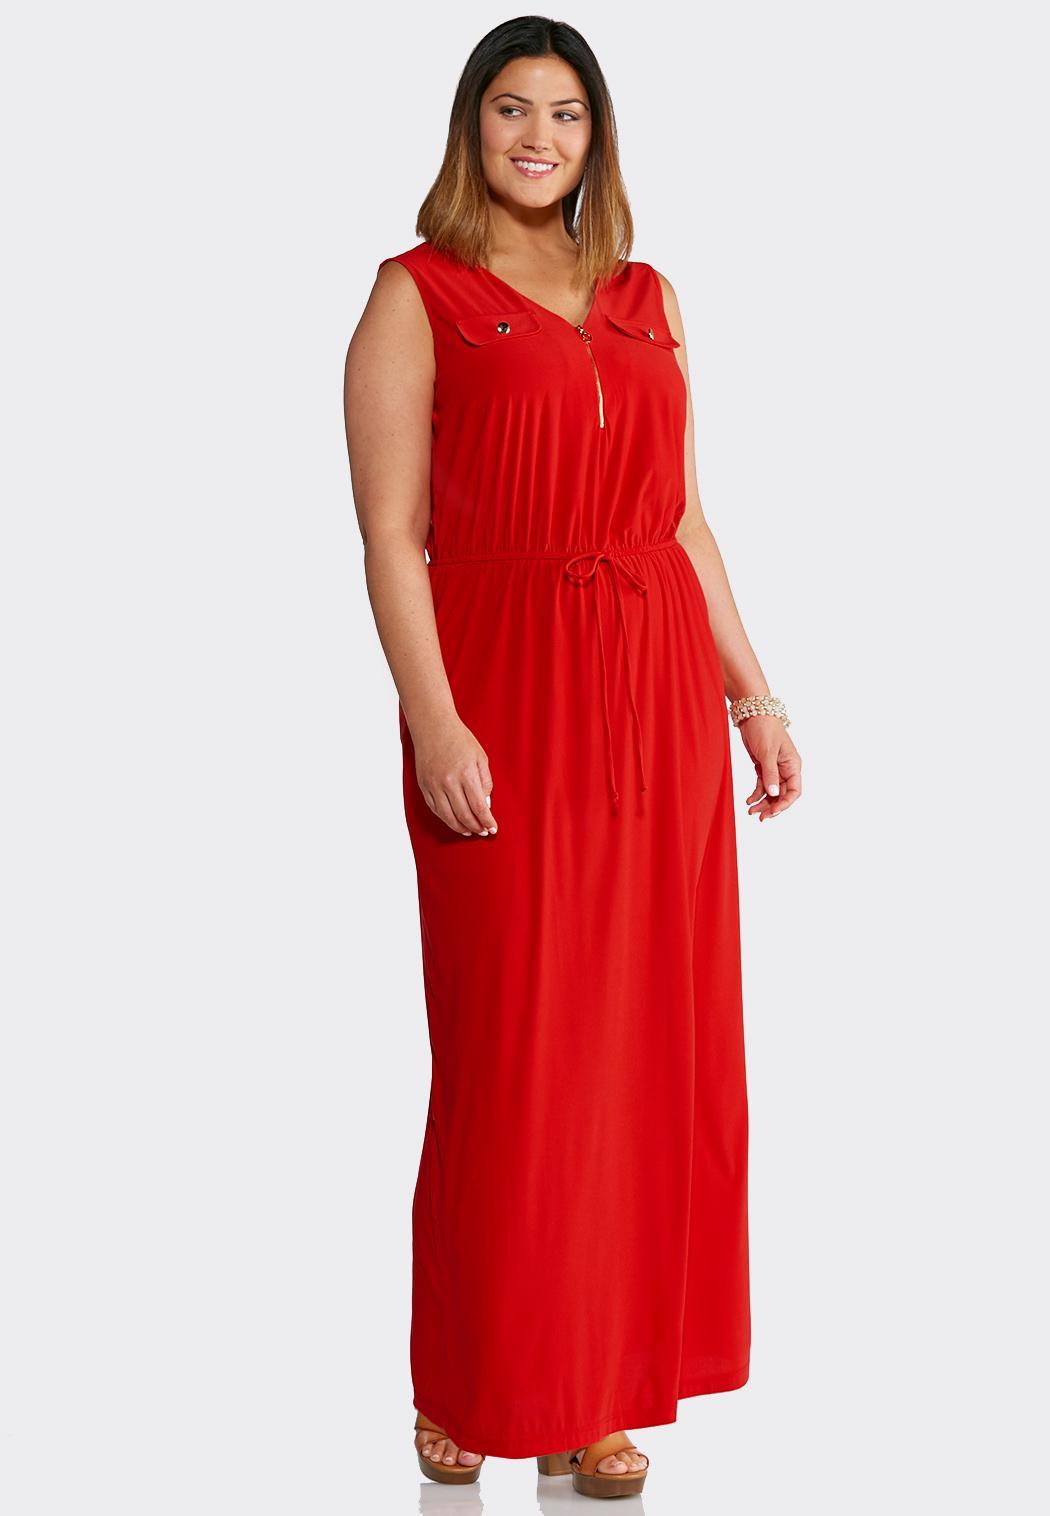 Plus Size Solid Zip Front Maxi Dress Maxi Cato Fashions